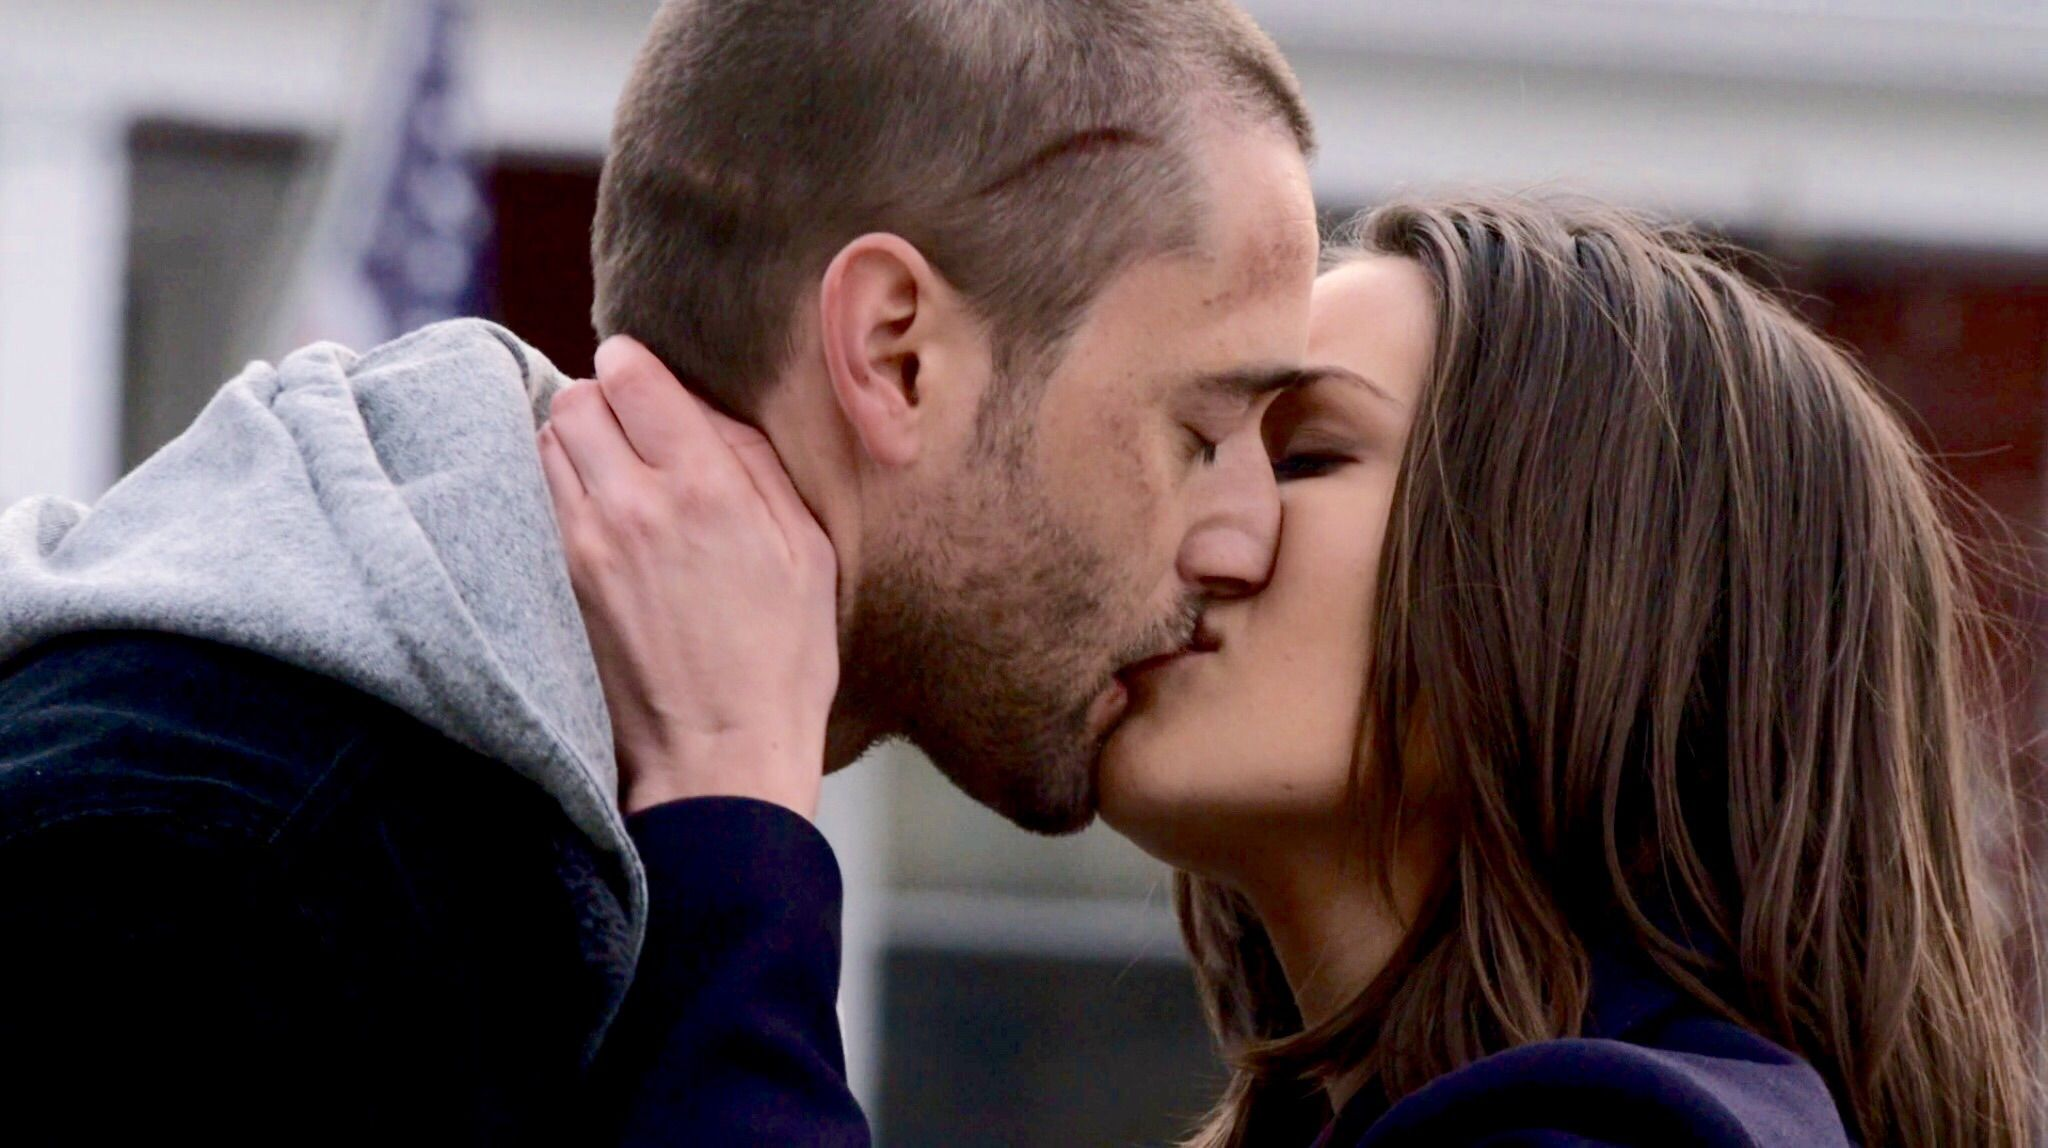 Megan boone kiss